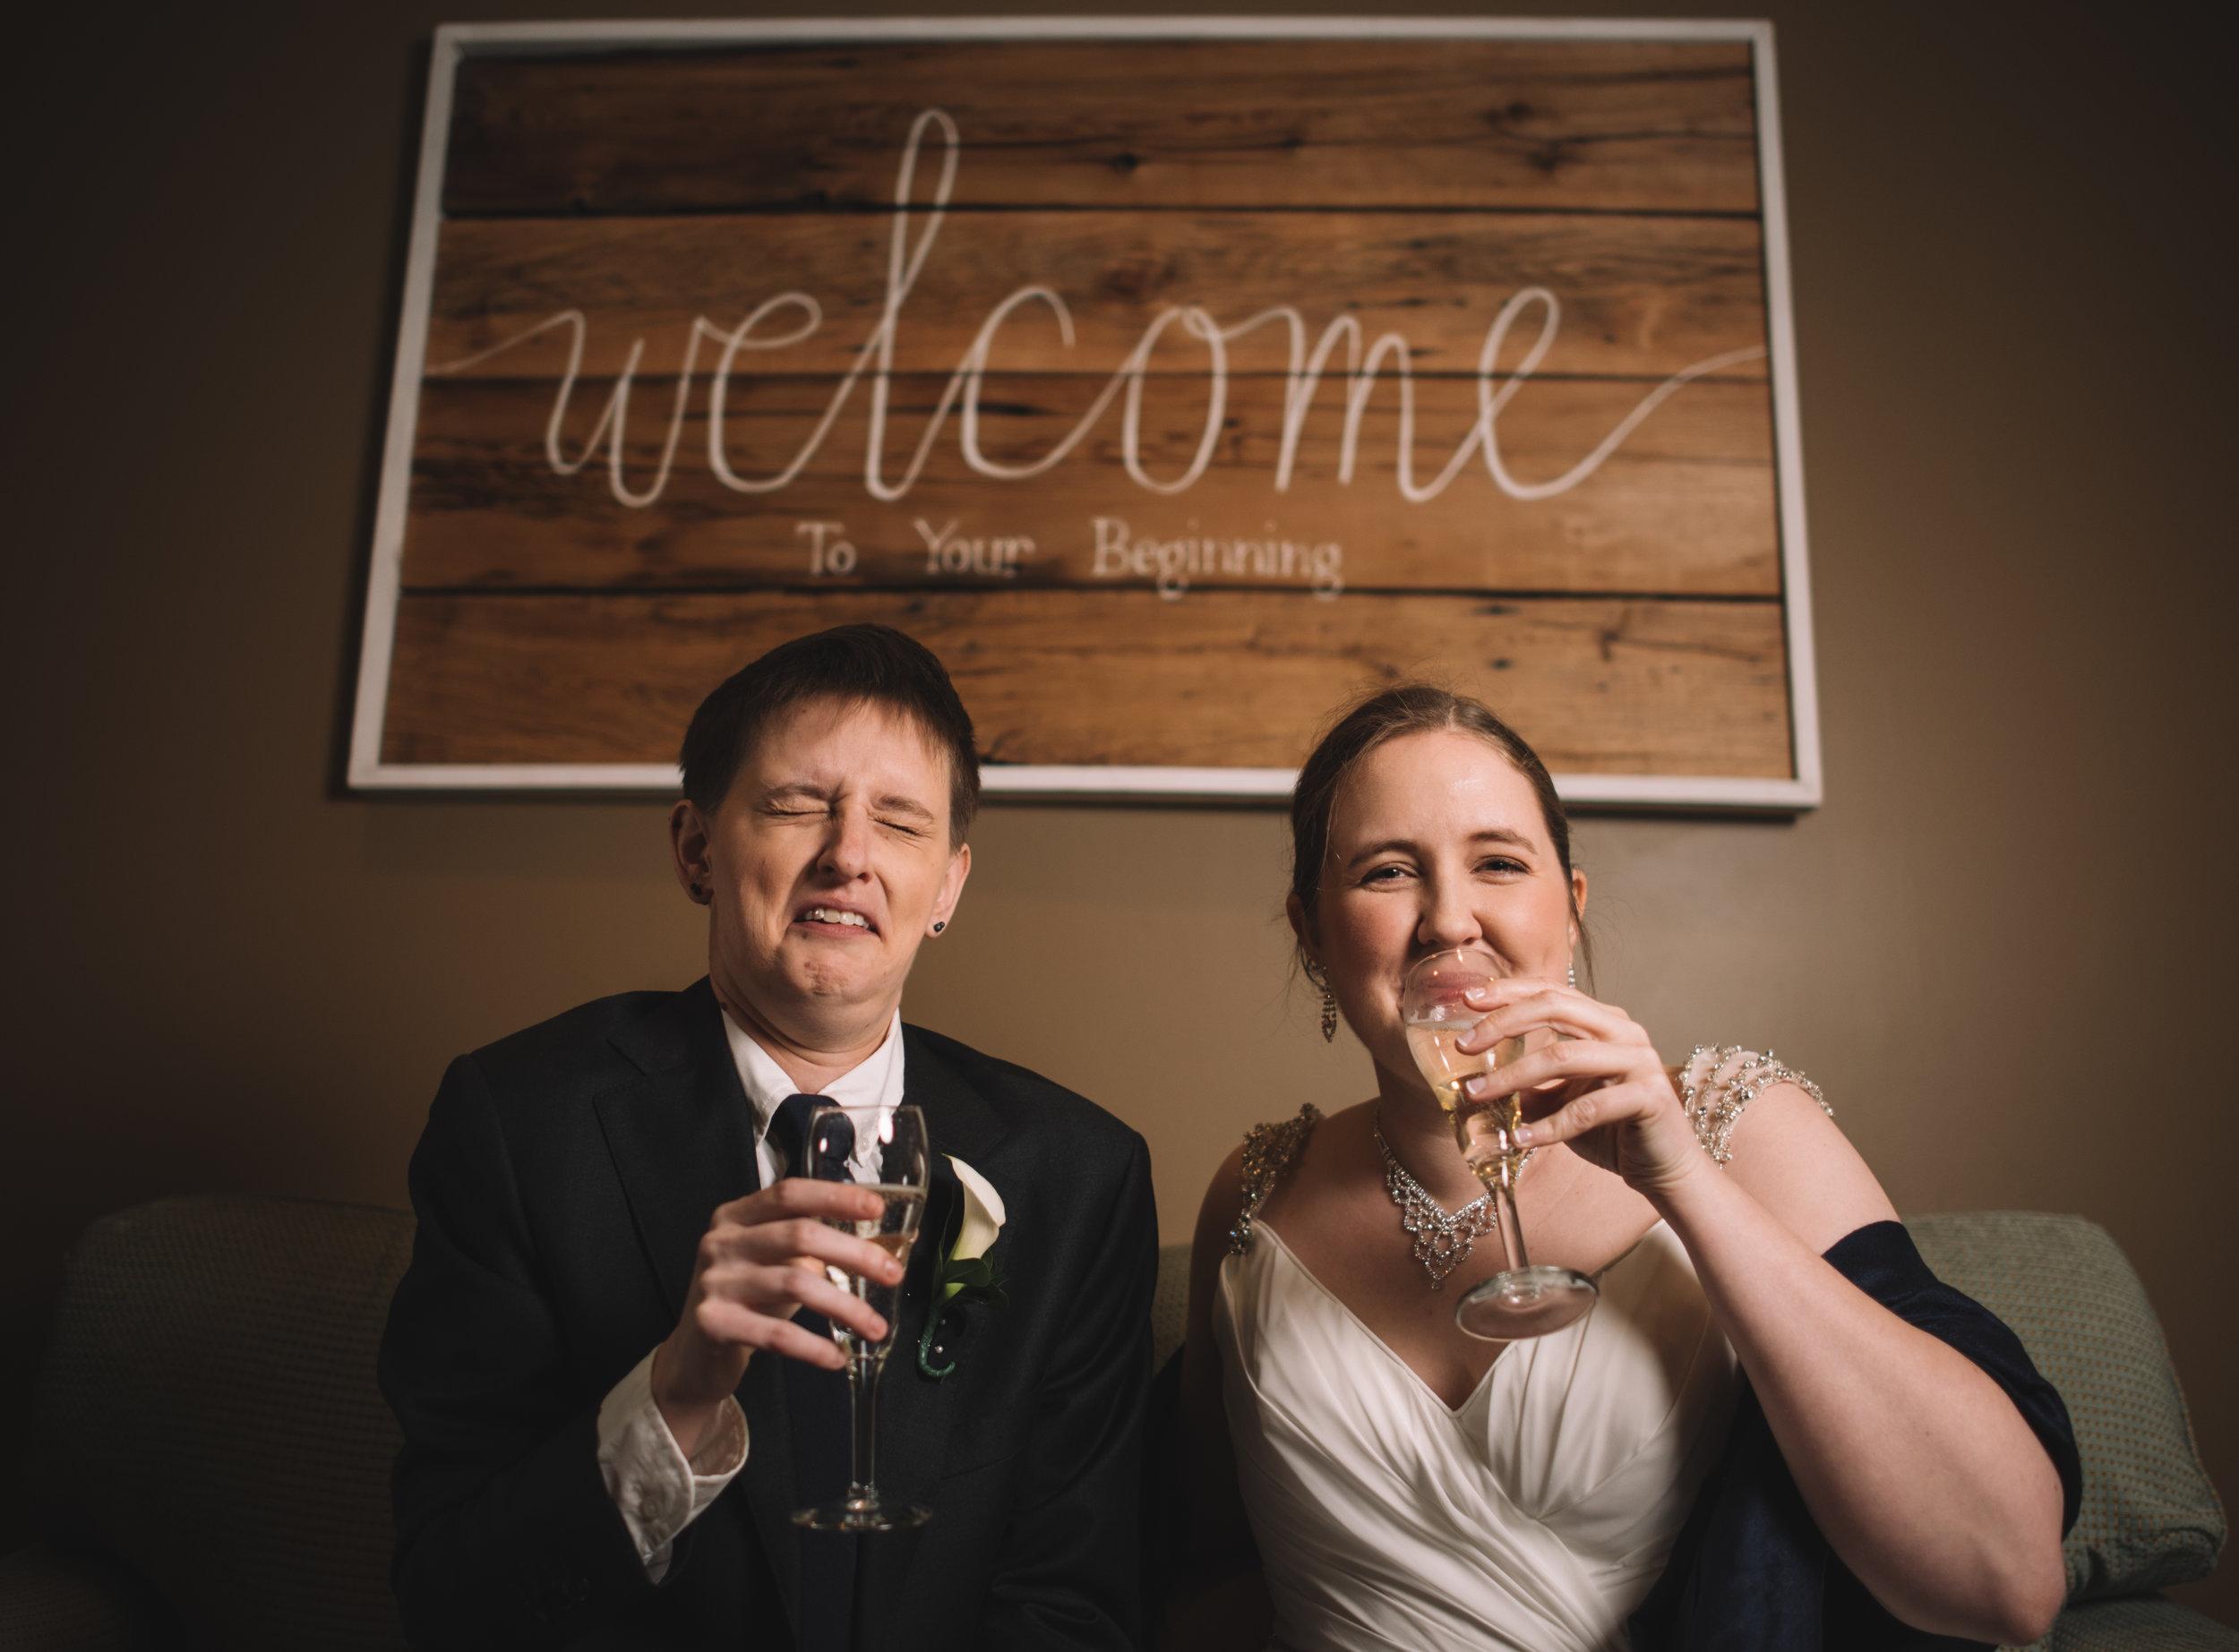 WeddingPhotos | NJPhotographer | Highlights-3-2.jpg